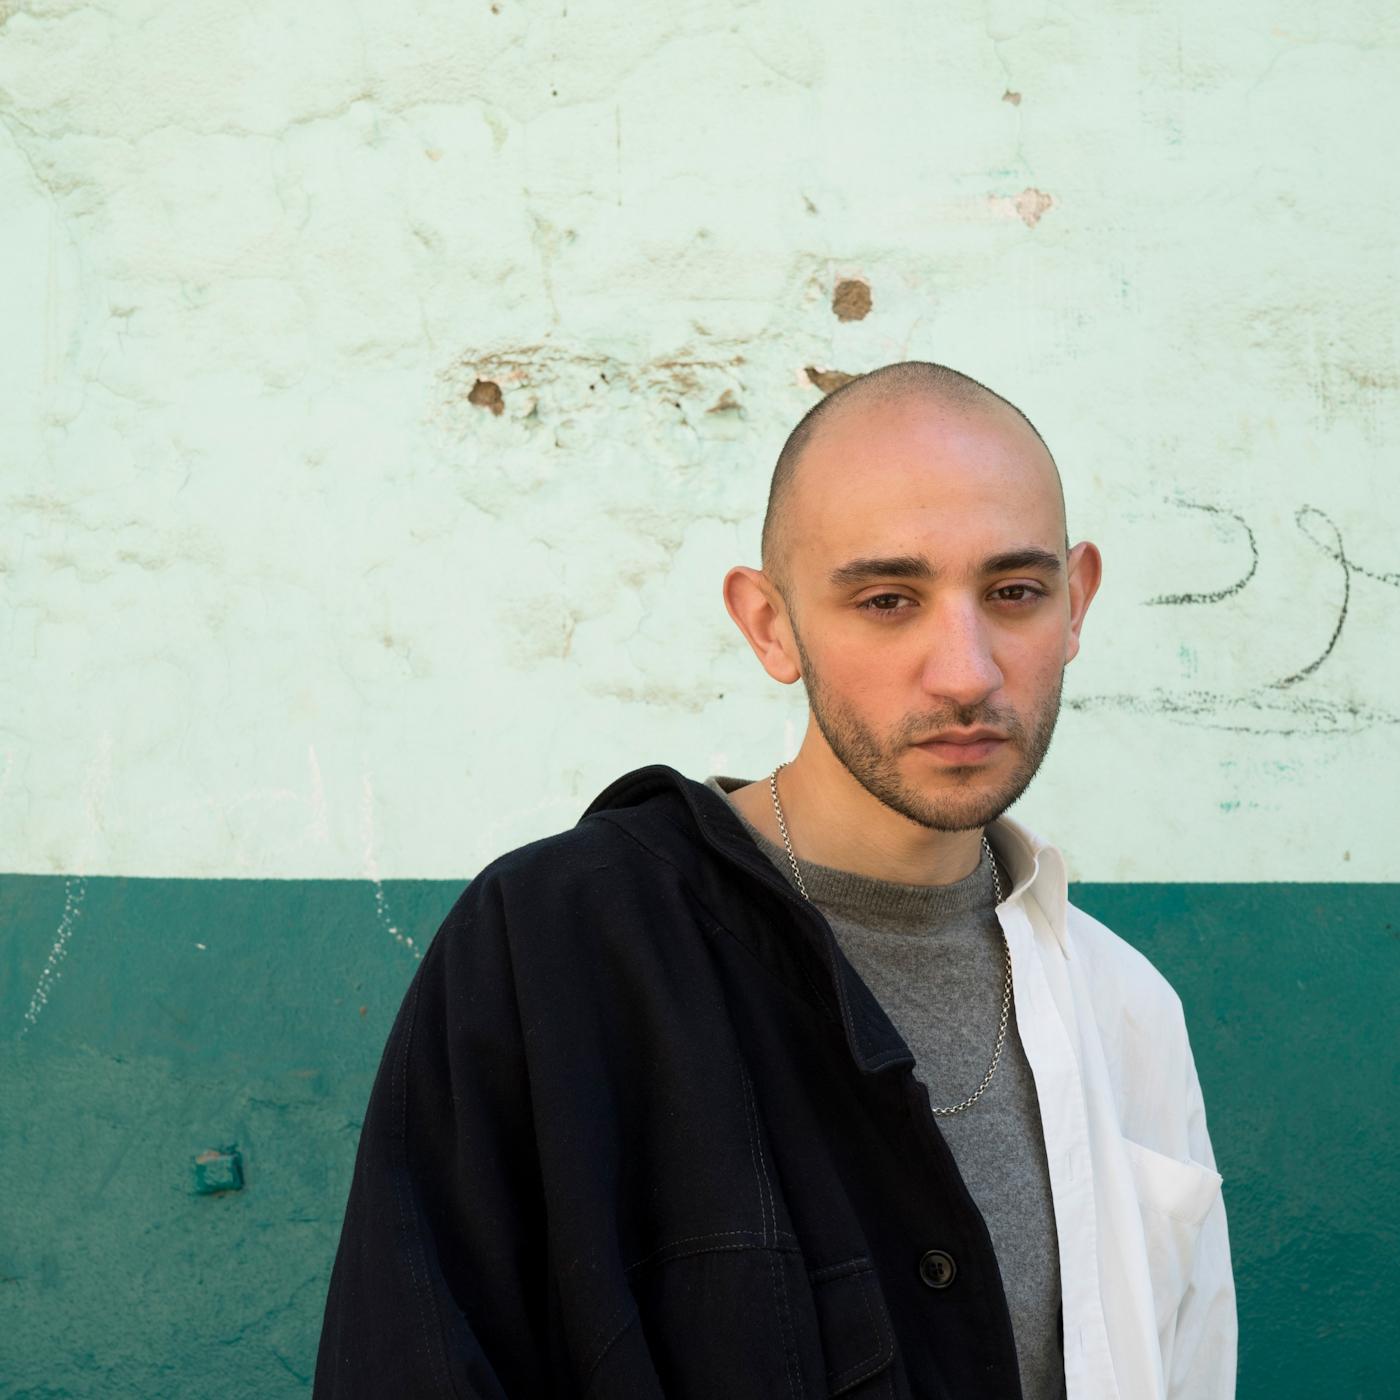 Yazan El Zo'bi, Aman based Artist from Morocco.